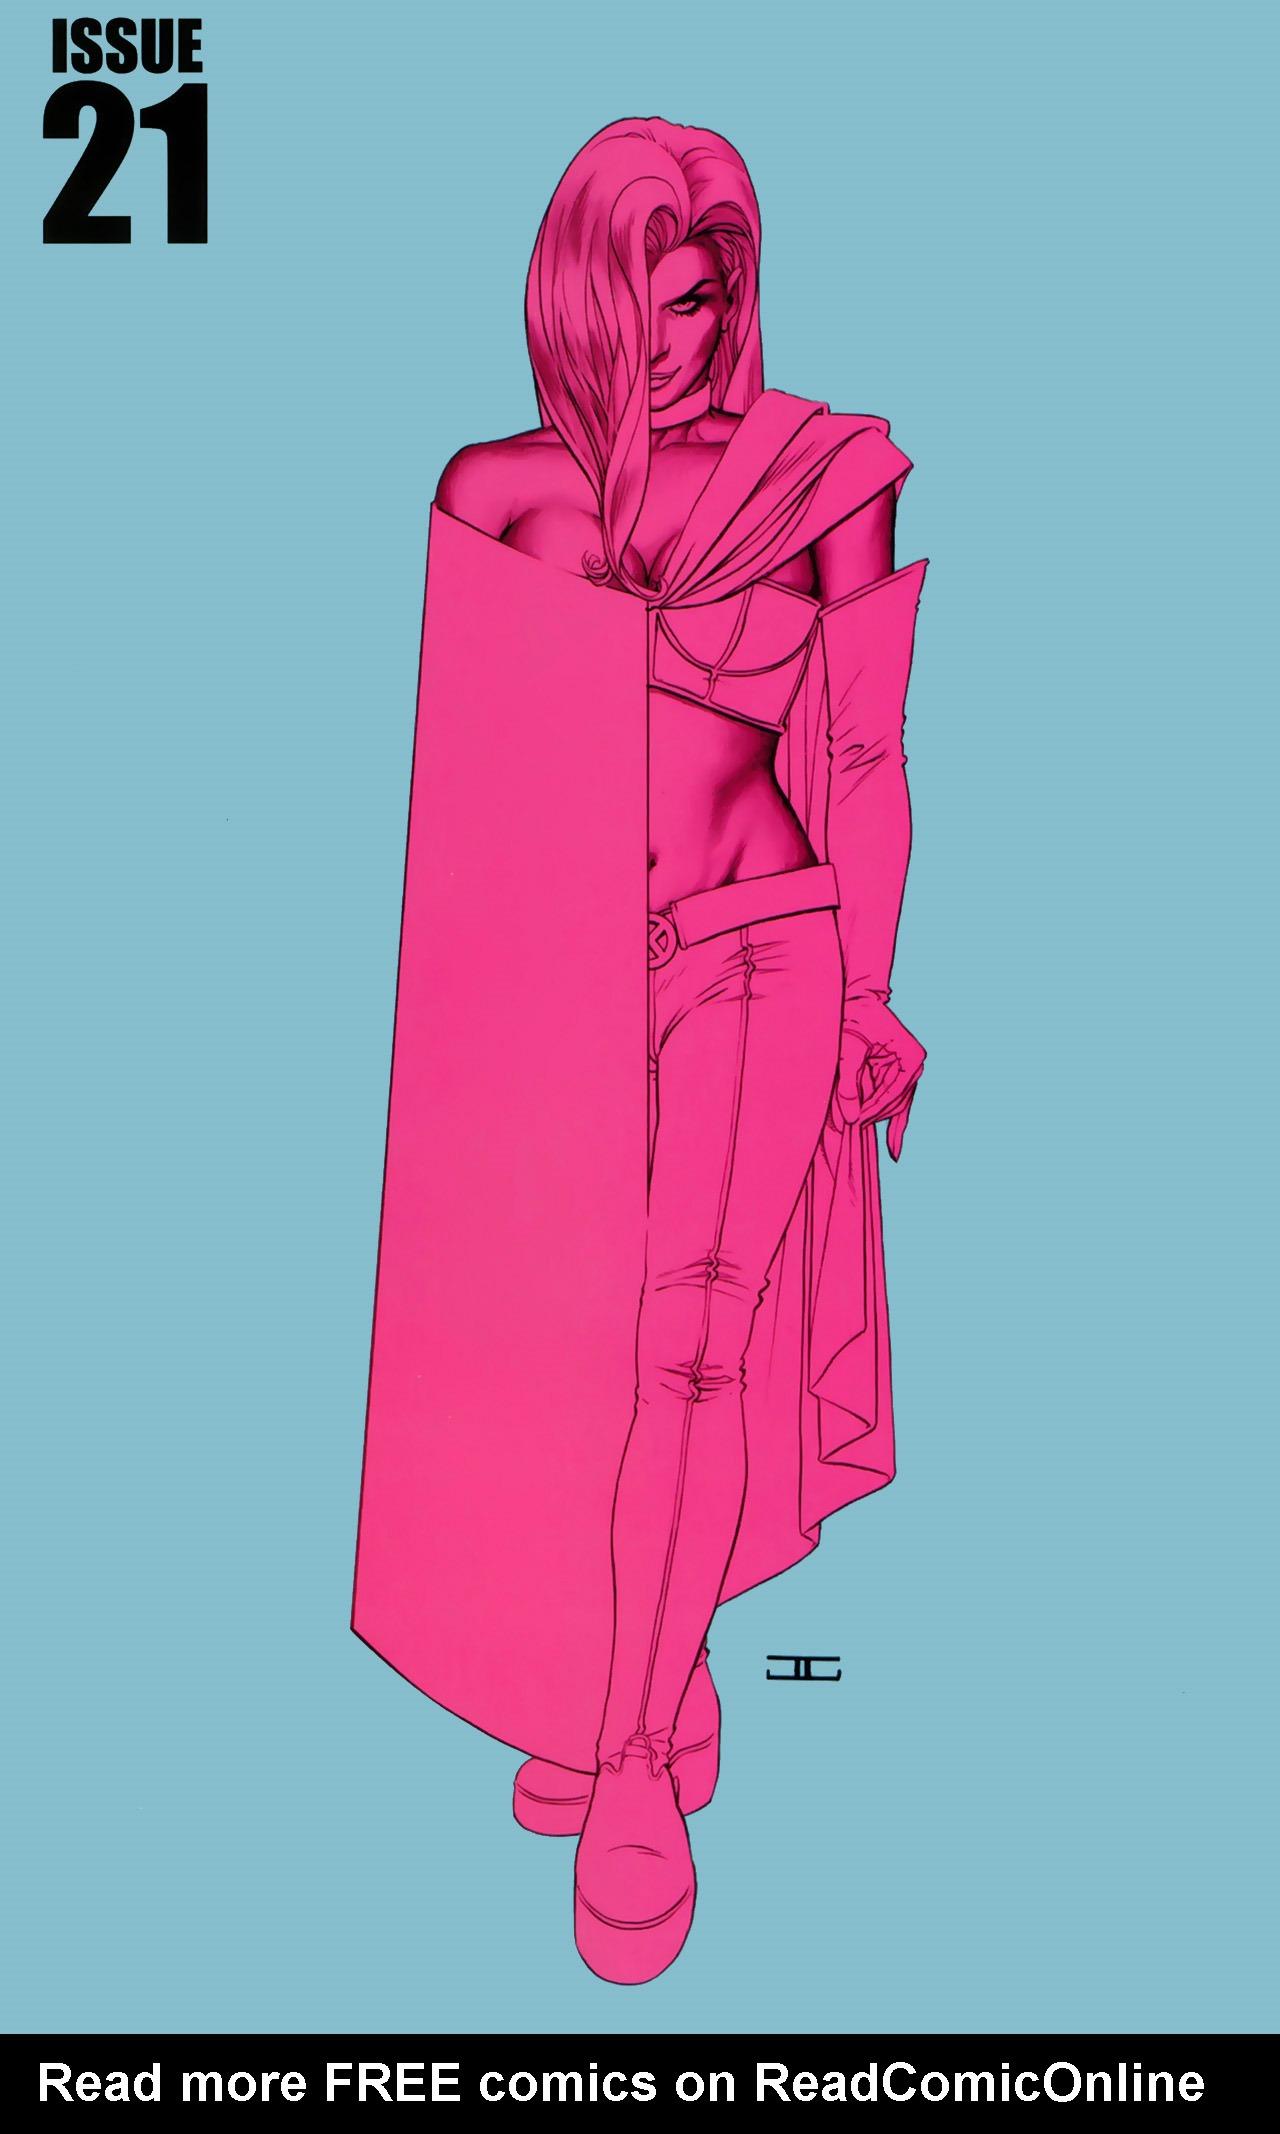 Read online Giant-Size Astonishing X-Men comic -  Issue # Full - 51